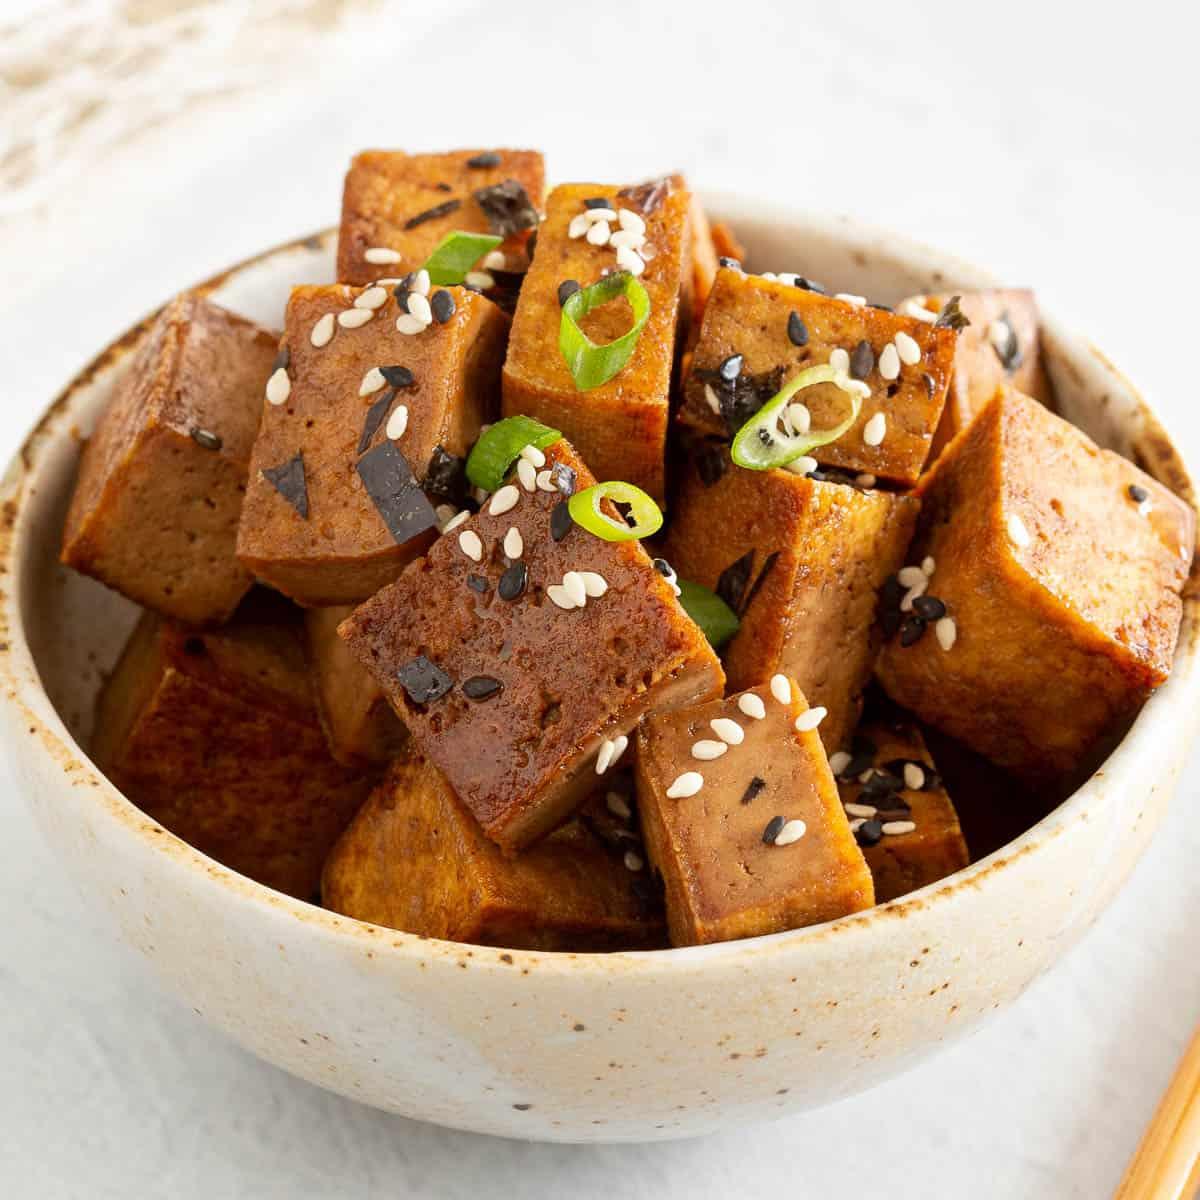 Close up shot of teriyaki tofu garnished with furikake and spring onion.